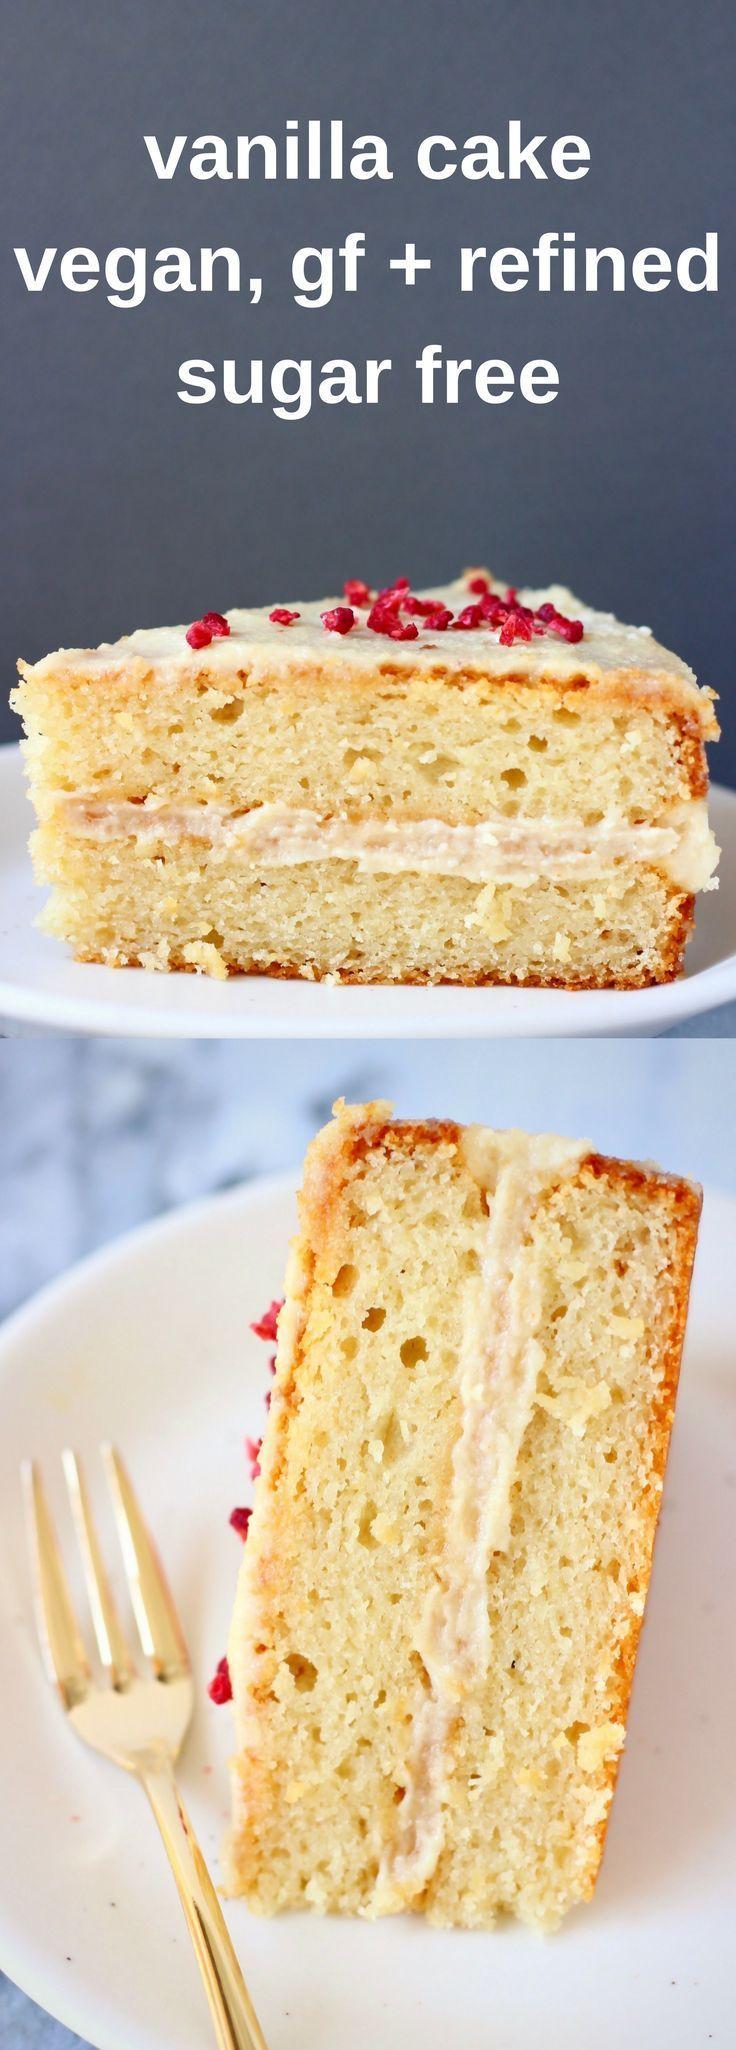 This GlutenFree Vegan Vanilla Cake has a moist and fluffy